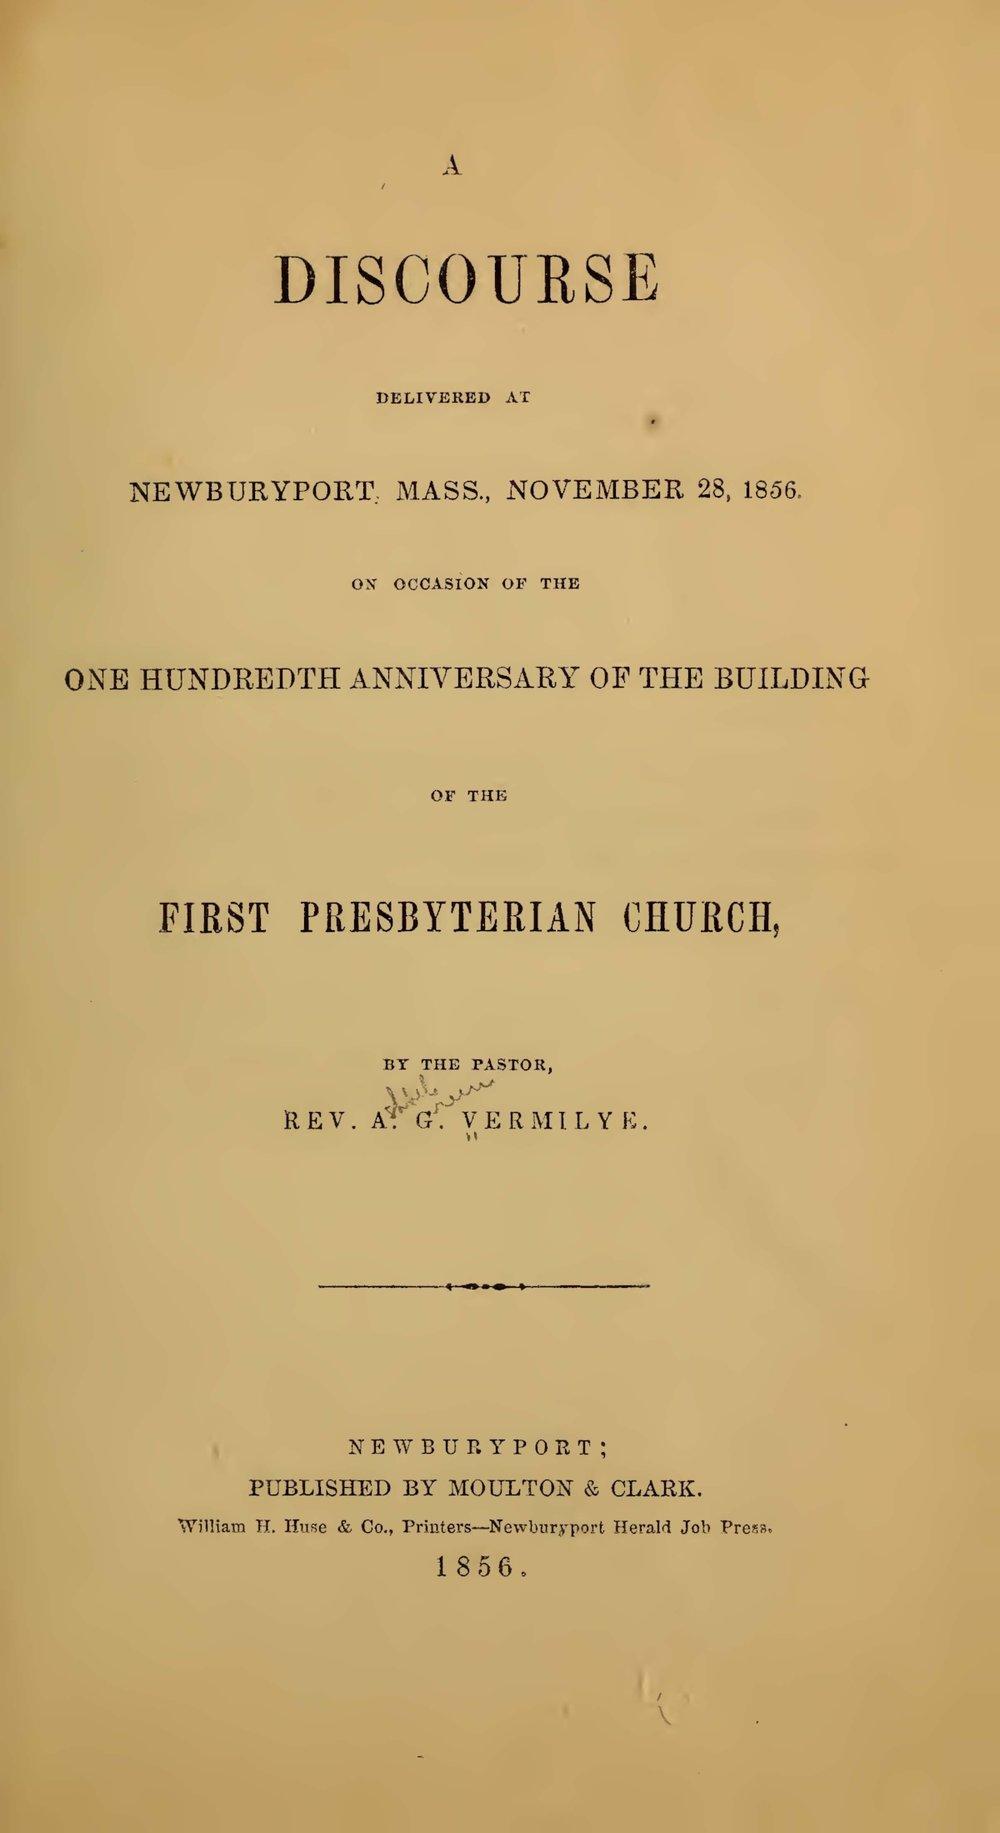 Vermilye, Ashbel Green, A Discourse Delivered at Newburyport, Mass. Title Page.jpg